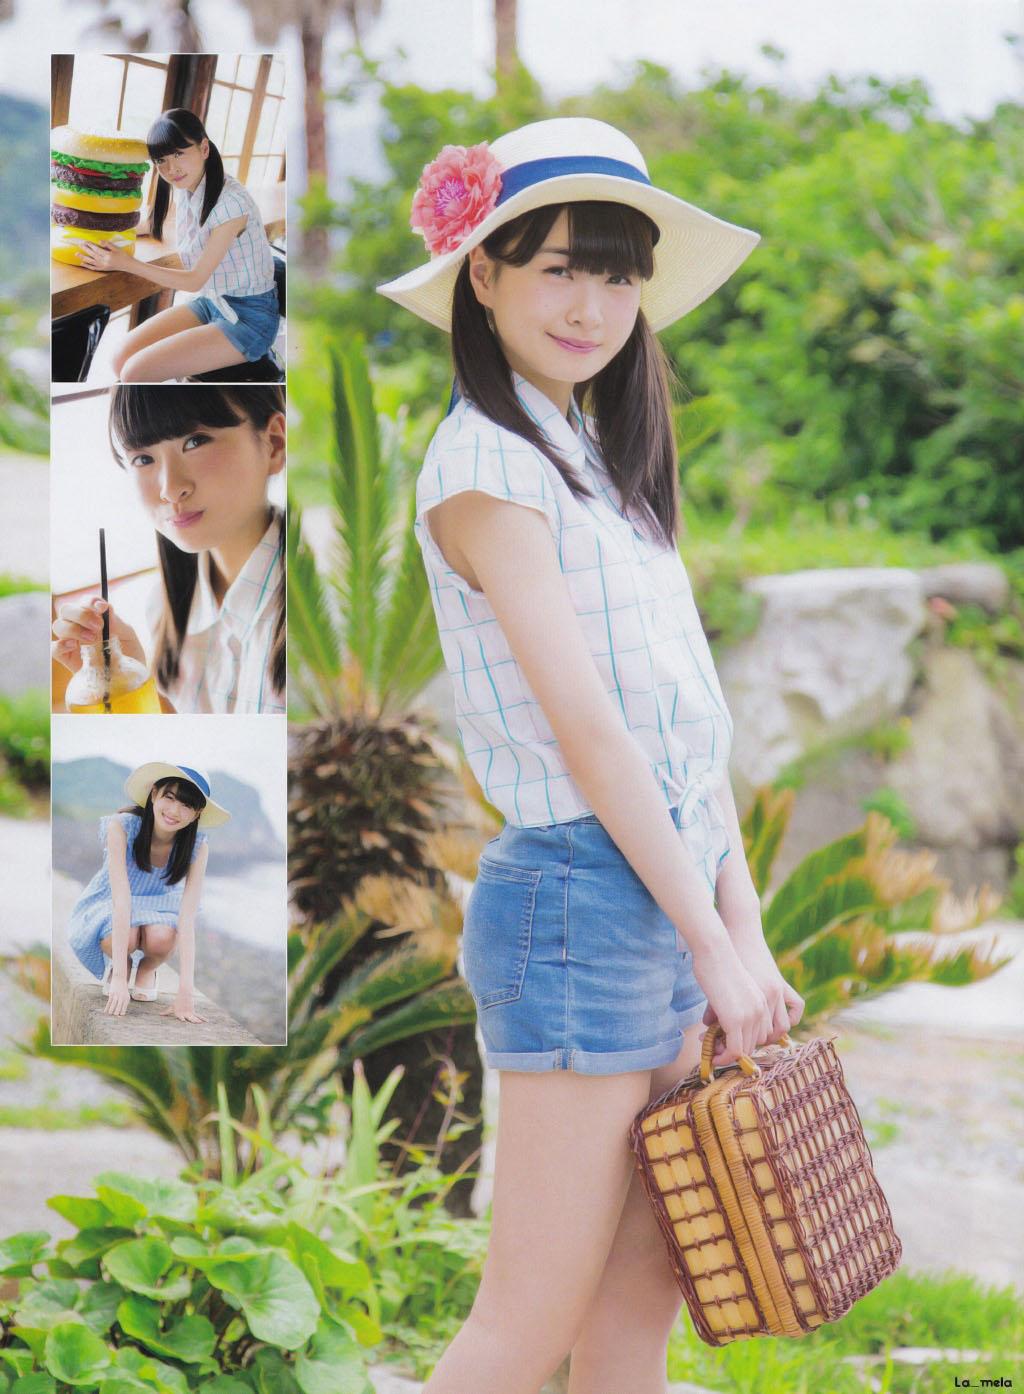 Matsuoka Hana 松岡はな HKT48, Monthly ENTAME 2016.08 Gravure